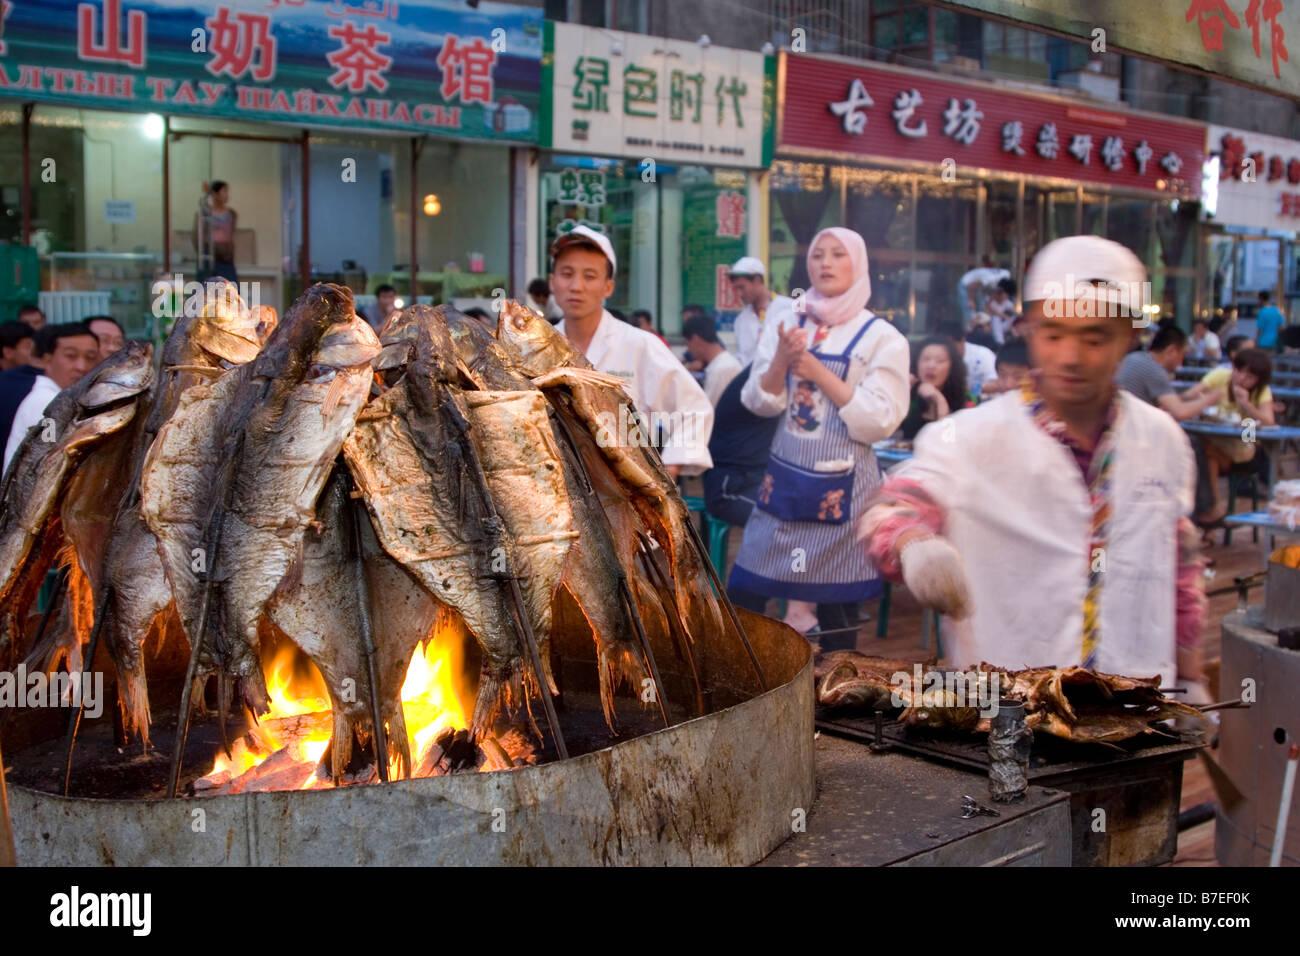 Grilling fish at the night market in Urumqi in Xinjiang in China Stock Photo: 21832067 - Alamy